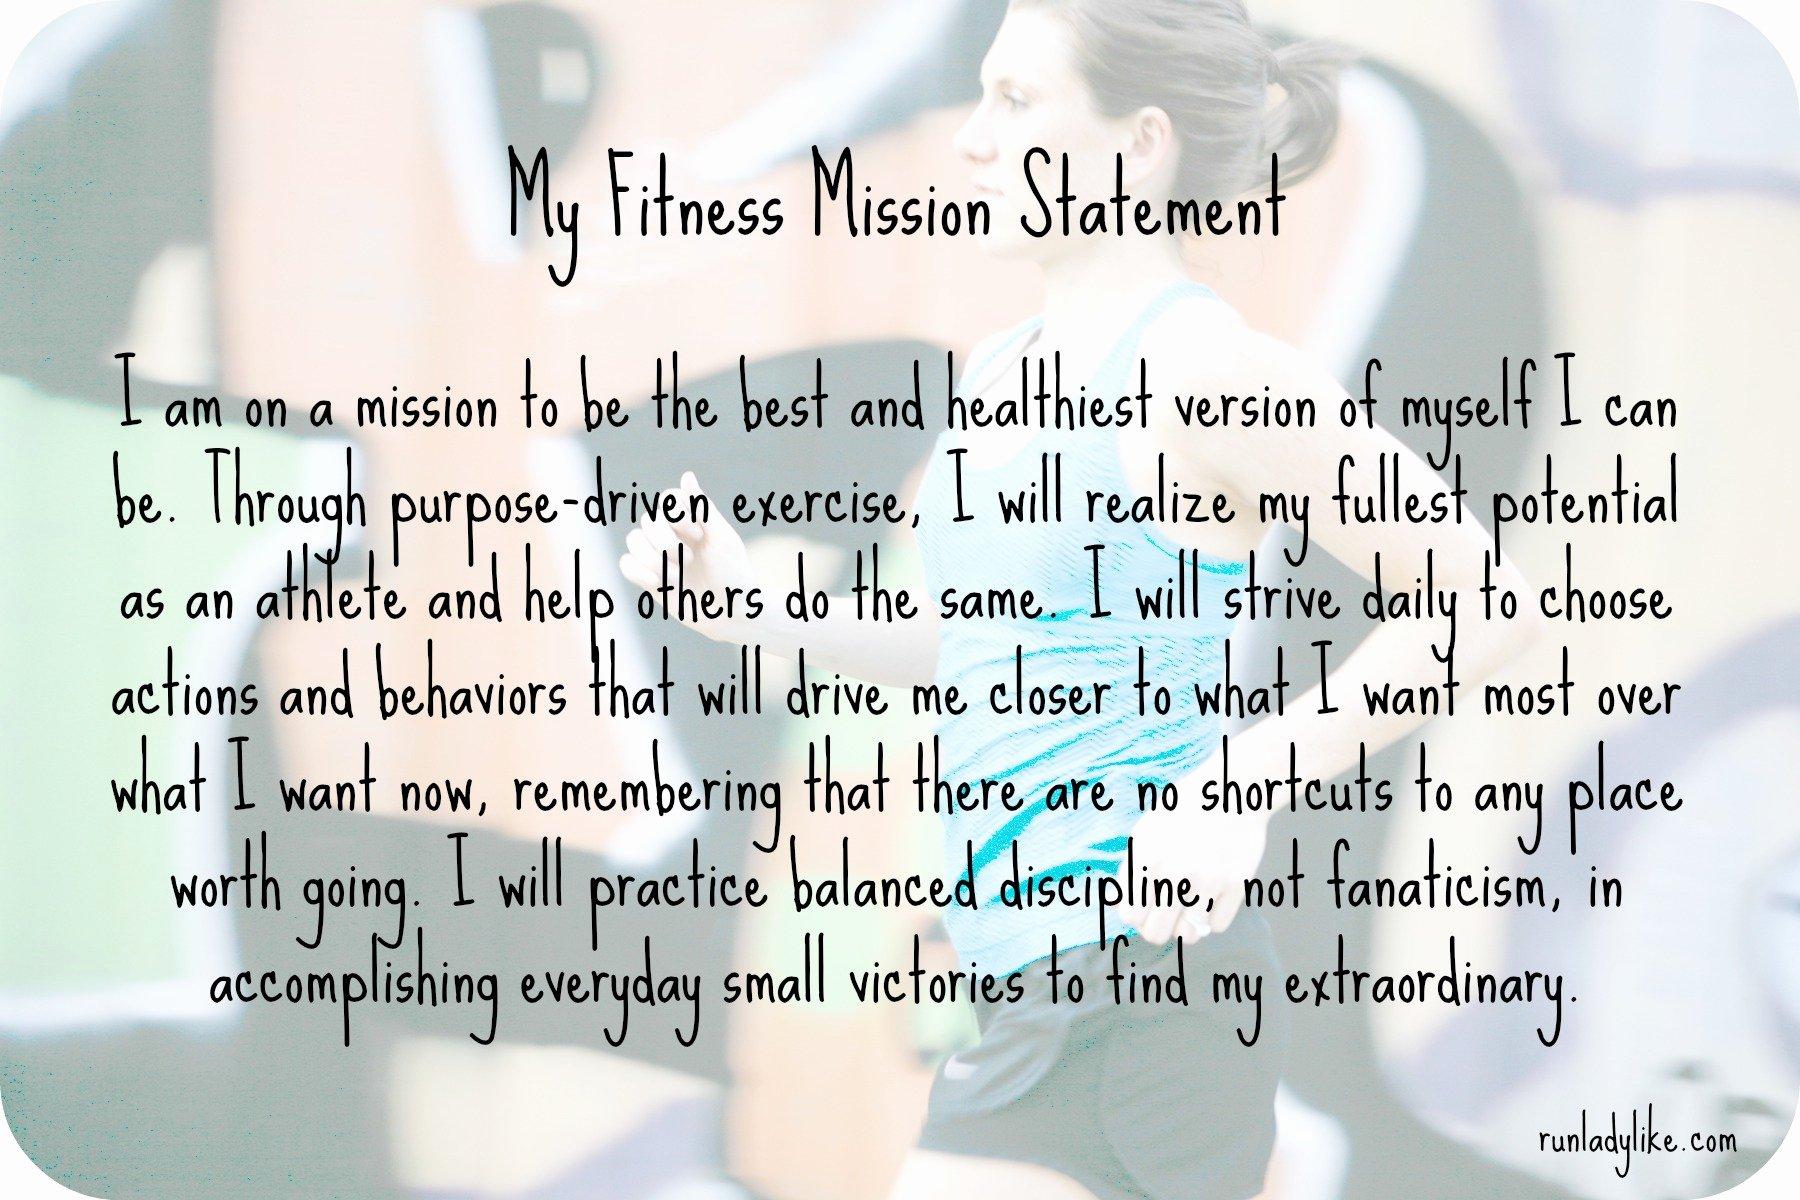 Lifetime Fitness Mission Statement Fresh My Fitness Mission Statement Runladylike